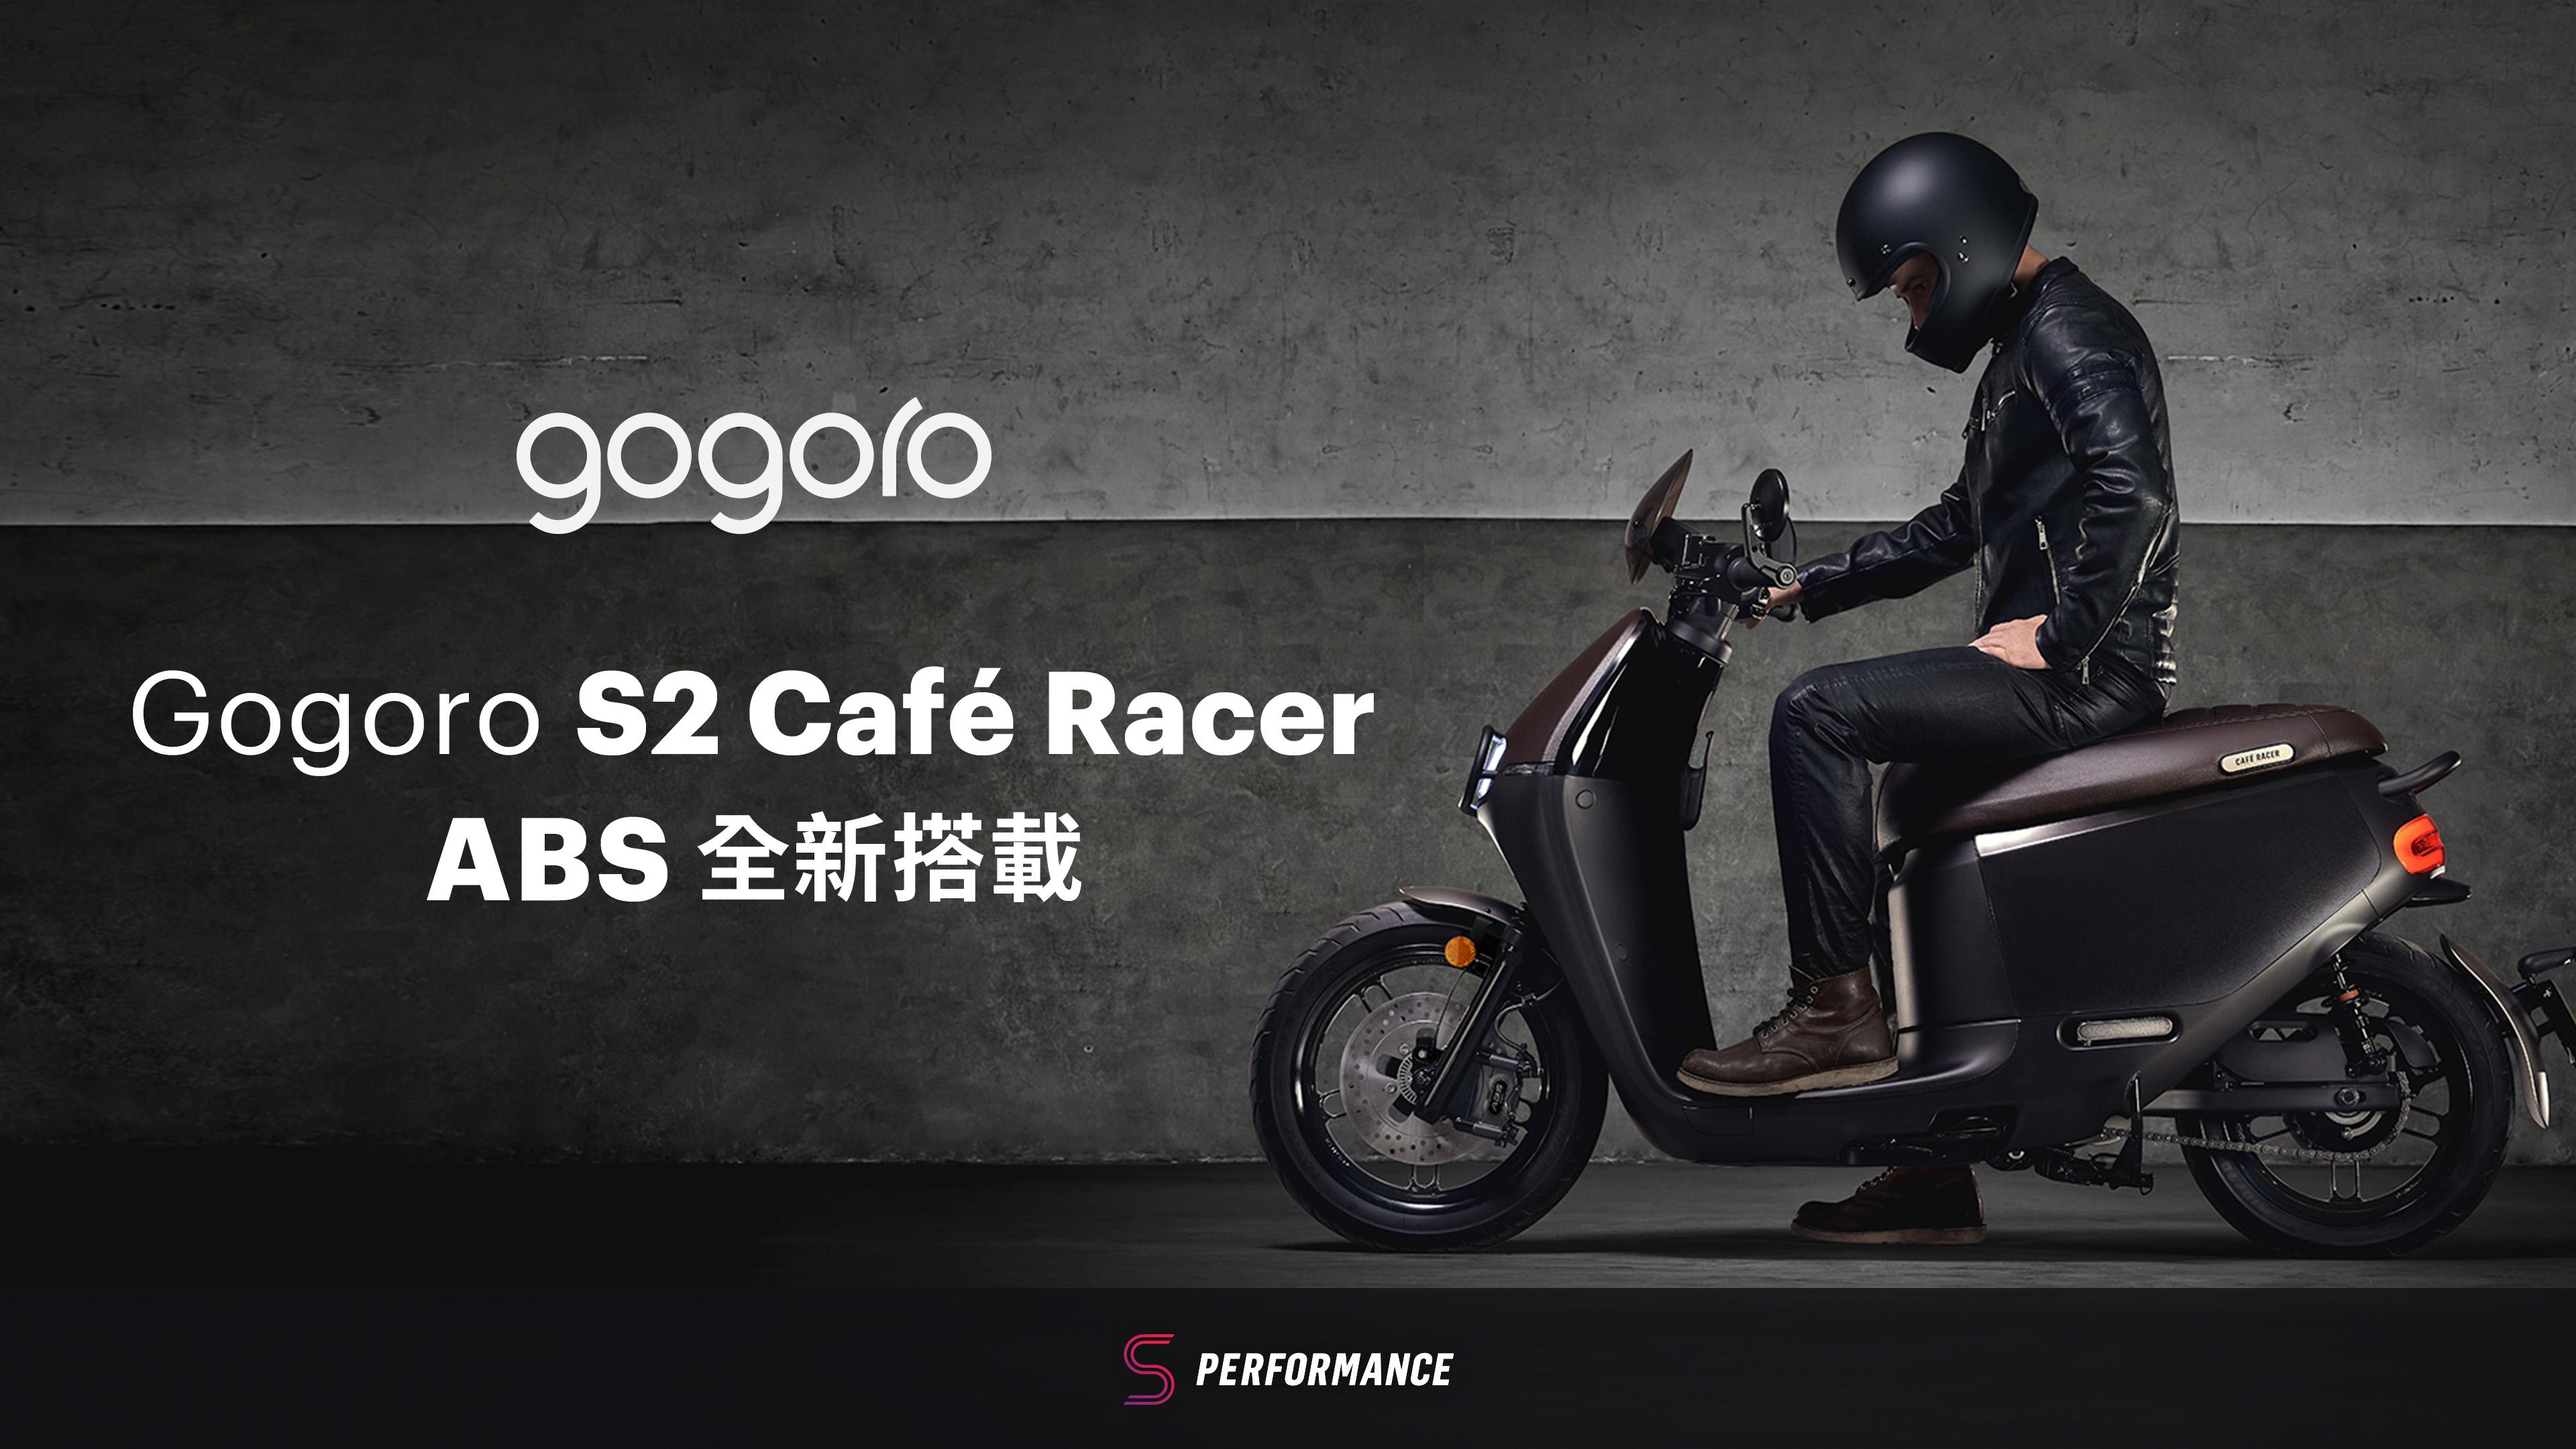 Gogoro ABS 全新雙車型 78,980 元起,全車系購車即送安全帽藍牙耳機